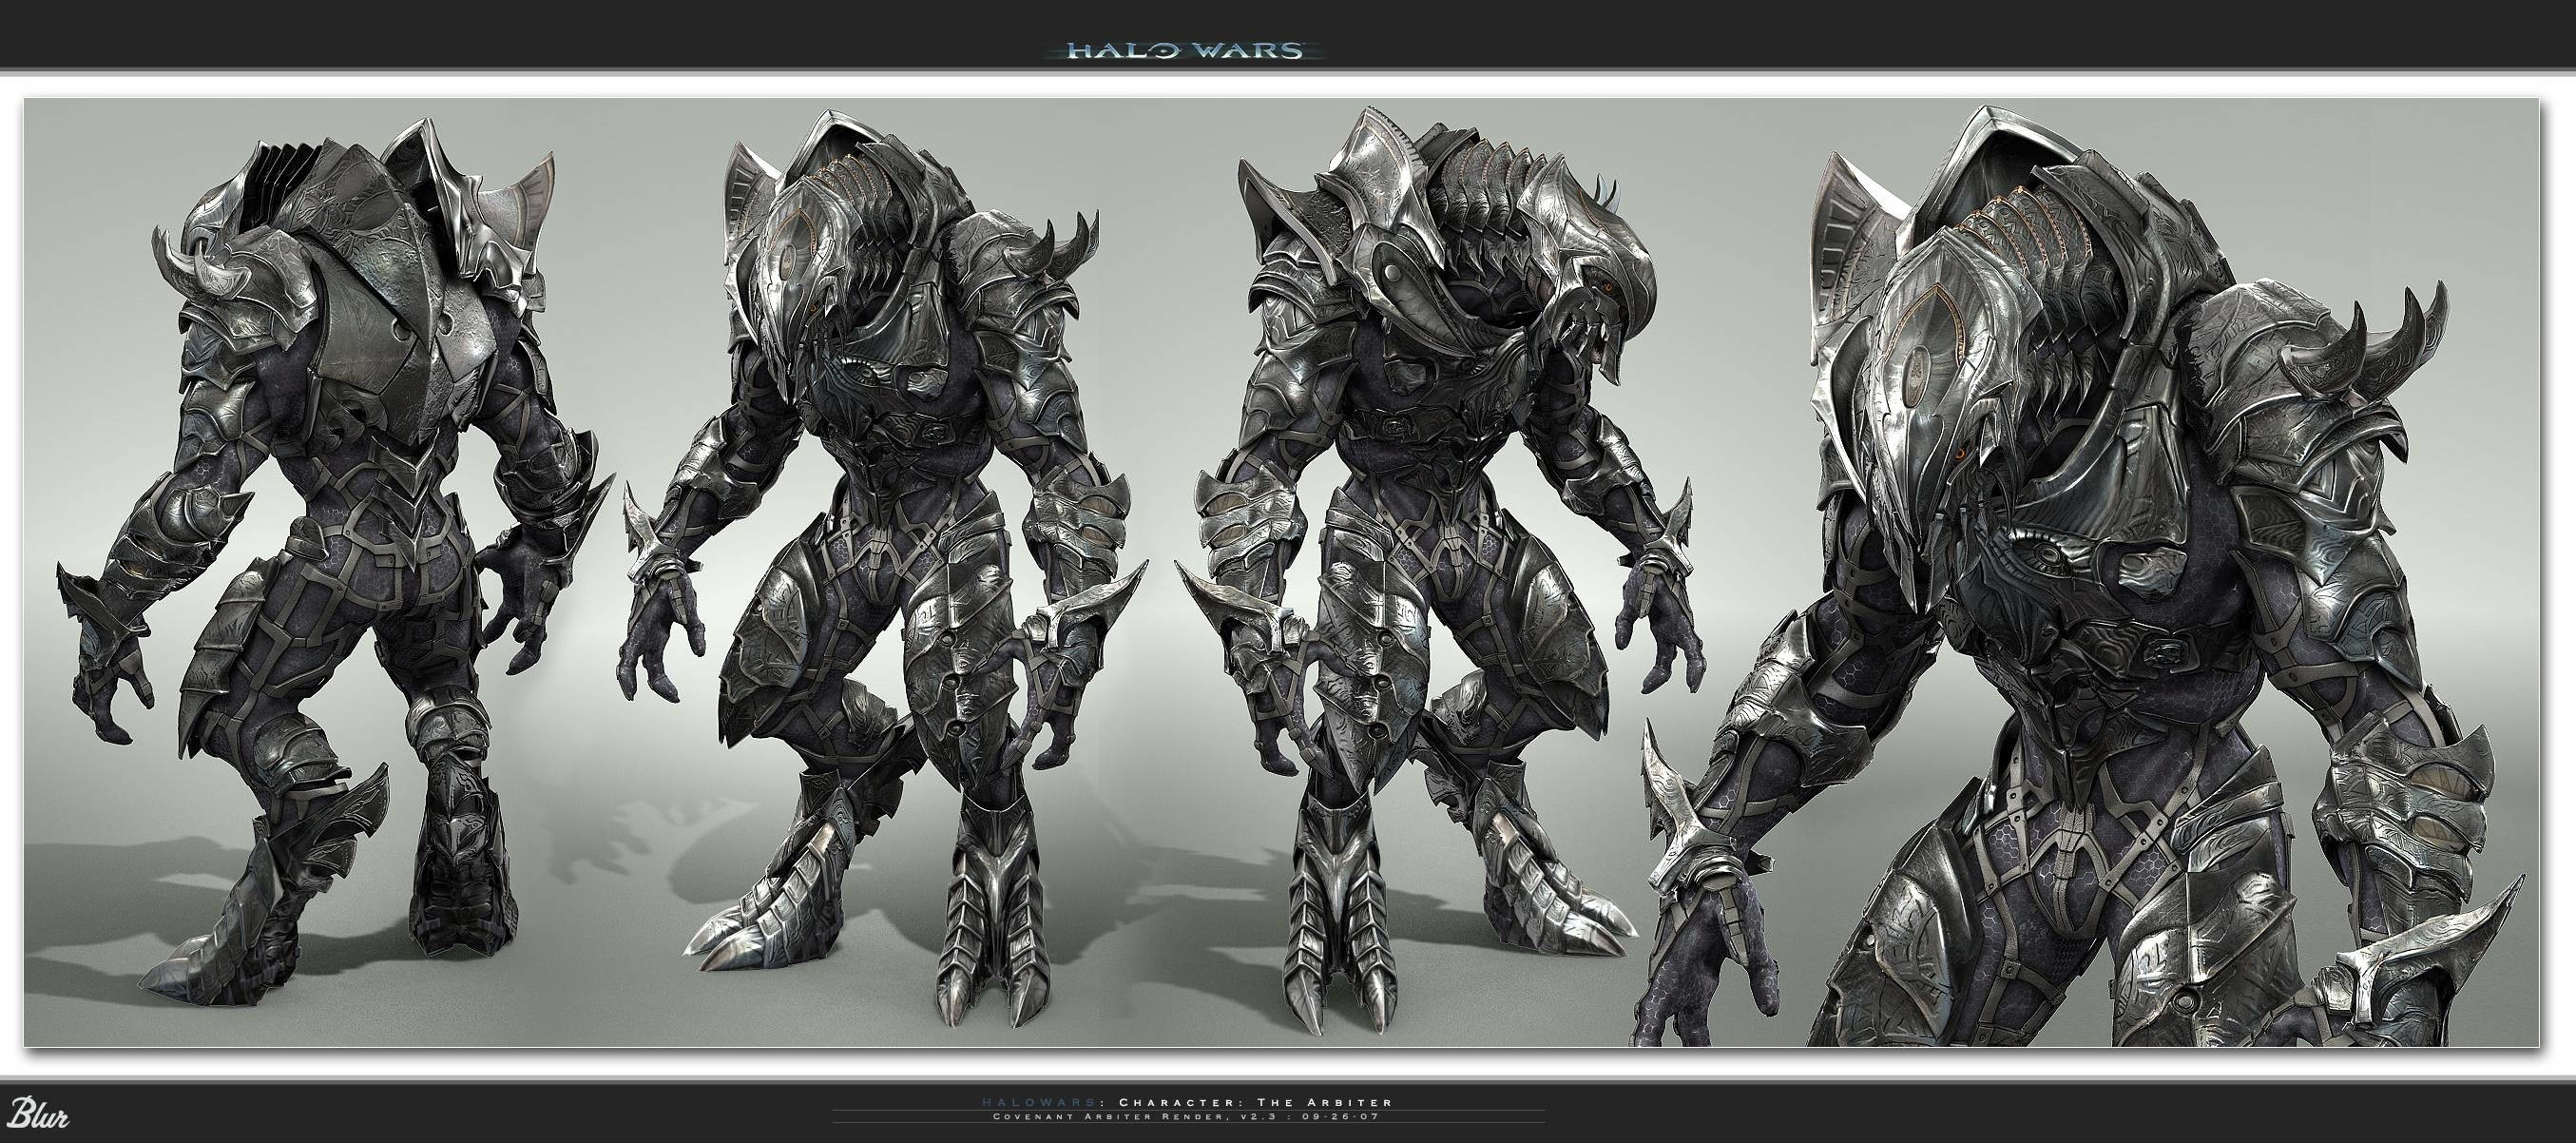 Images For > Halo Wars Arbiter Wallpaper